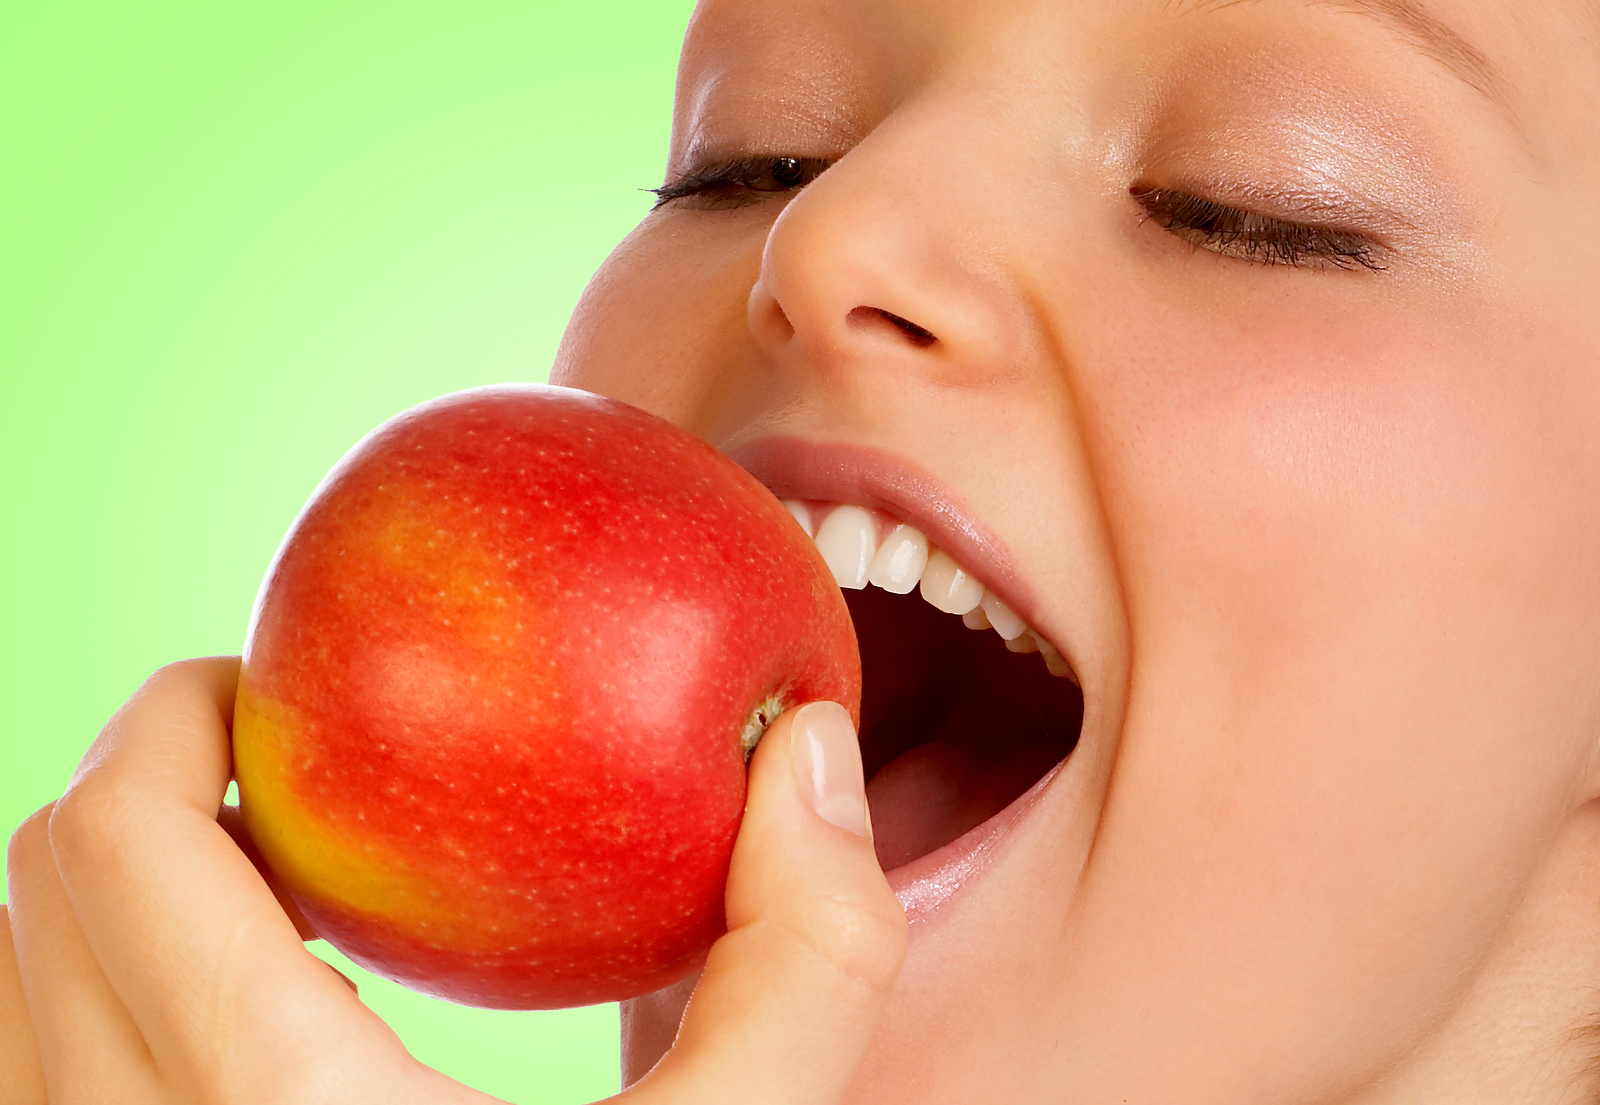 Eating Fruits After Food